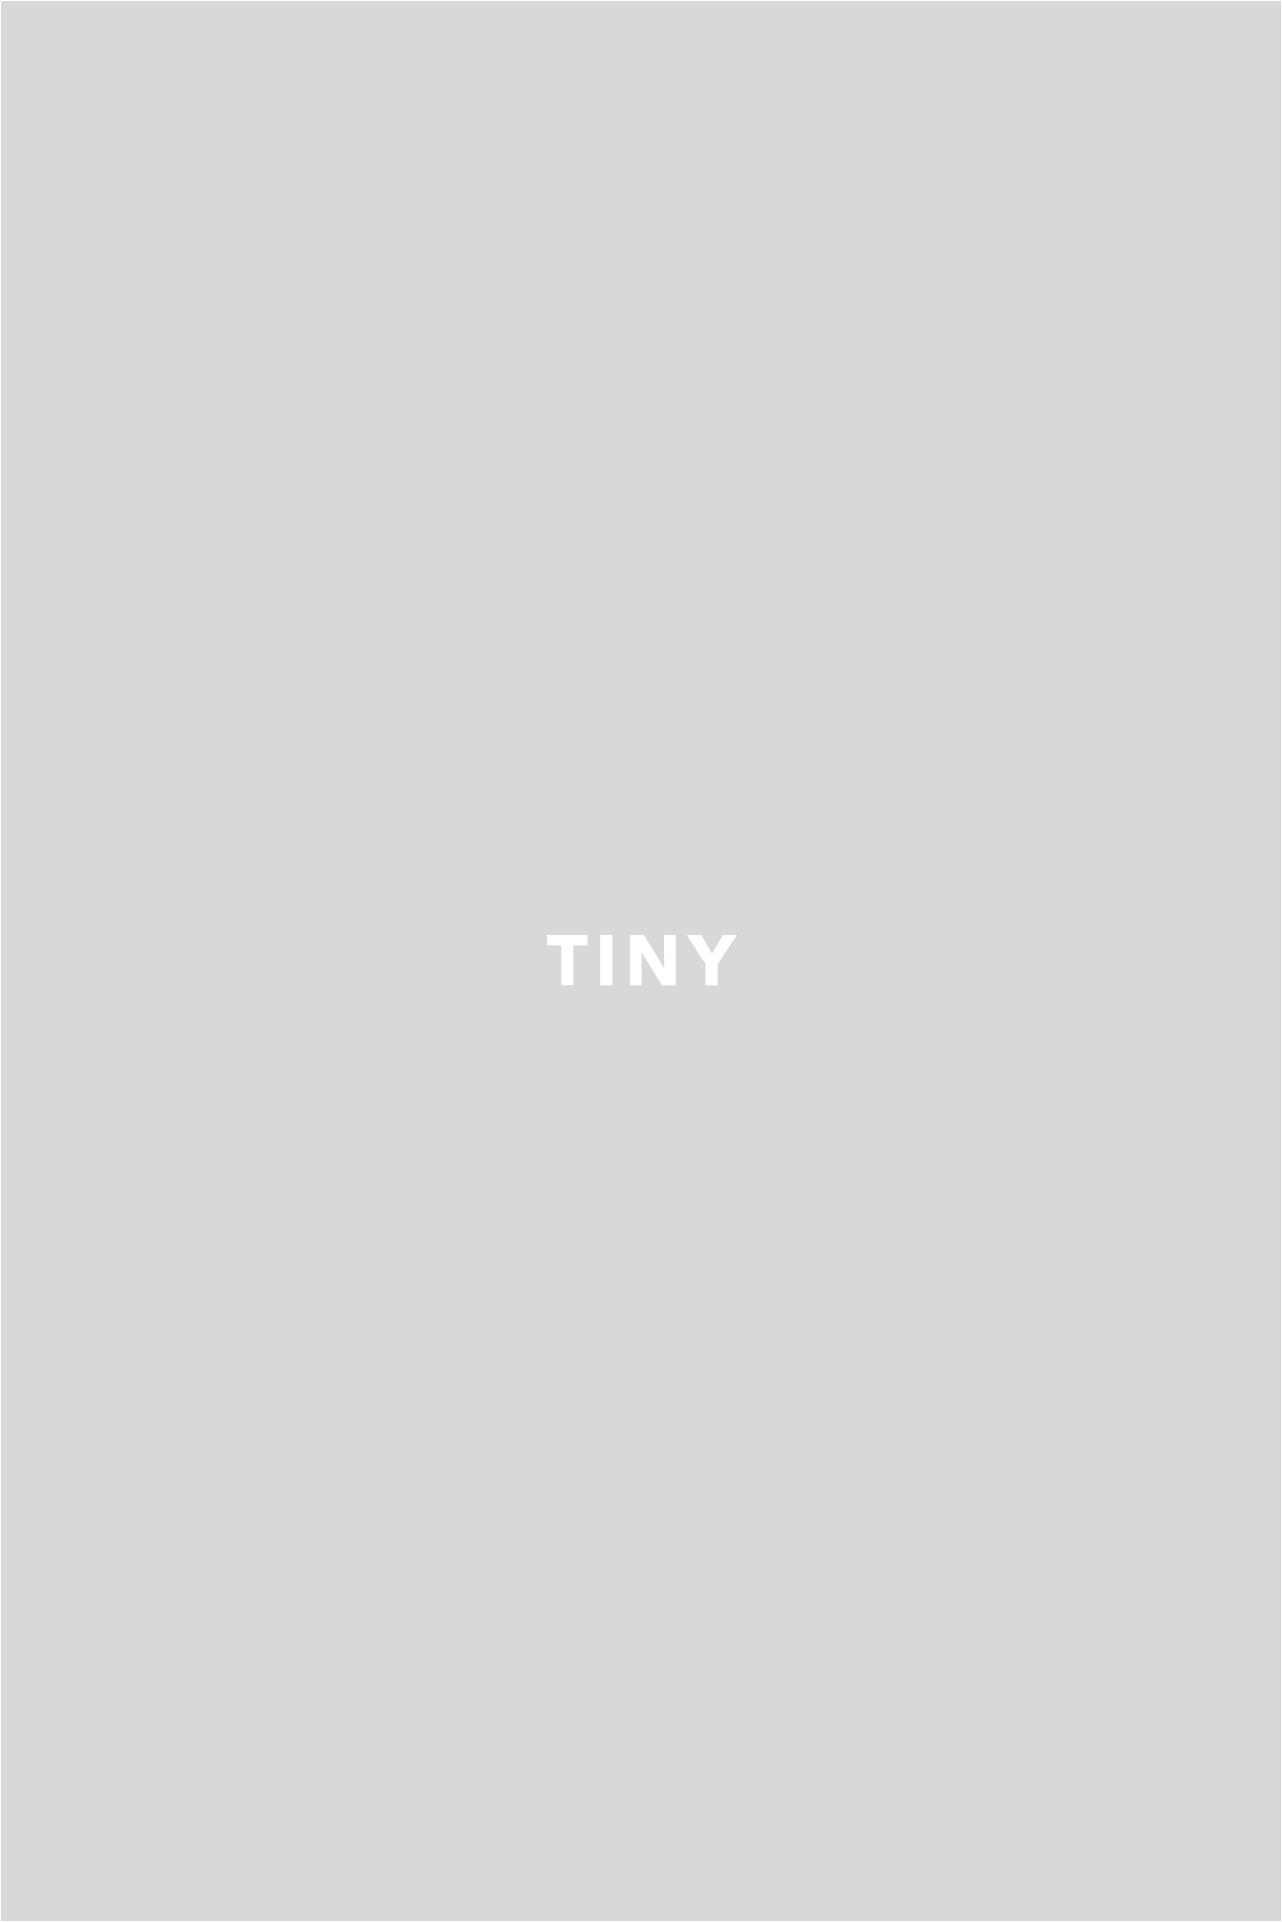 CAMISETA EXPEDITION TINY